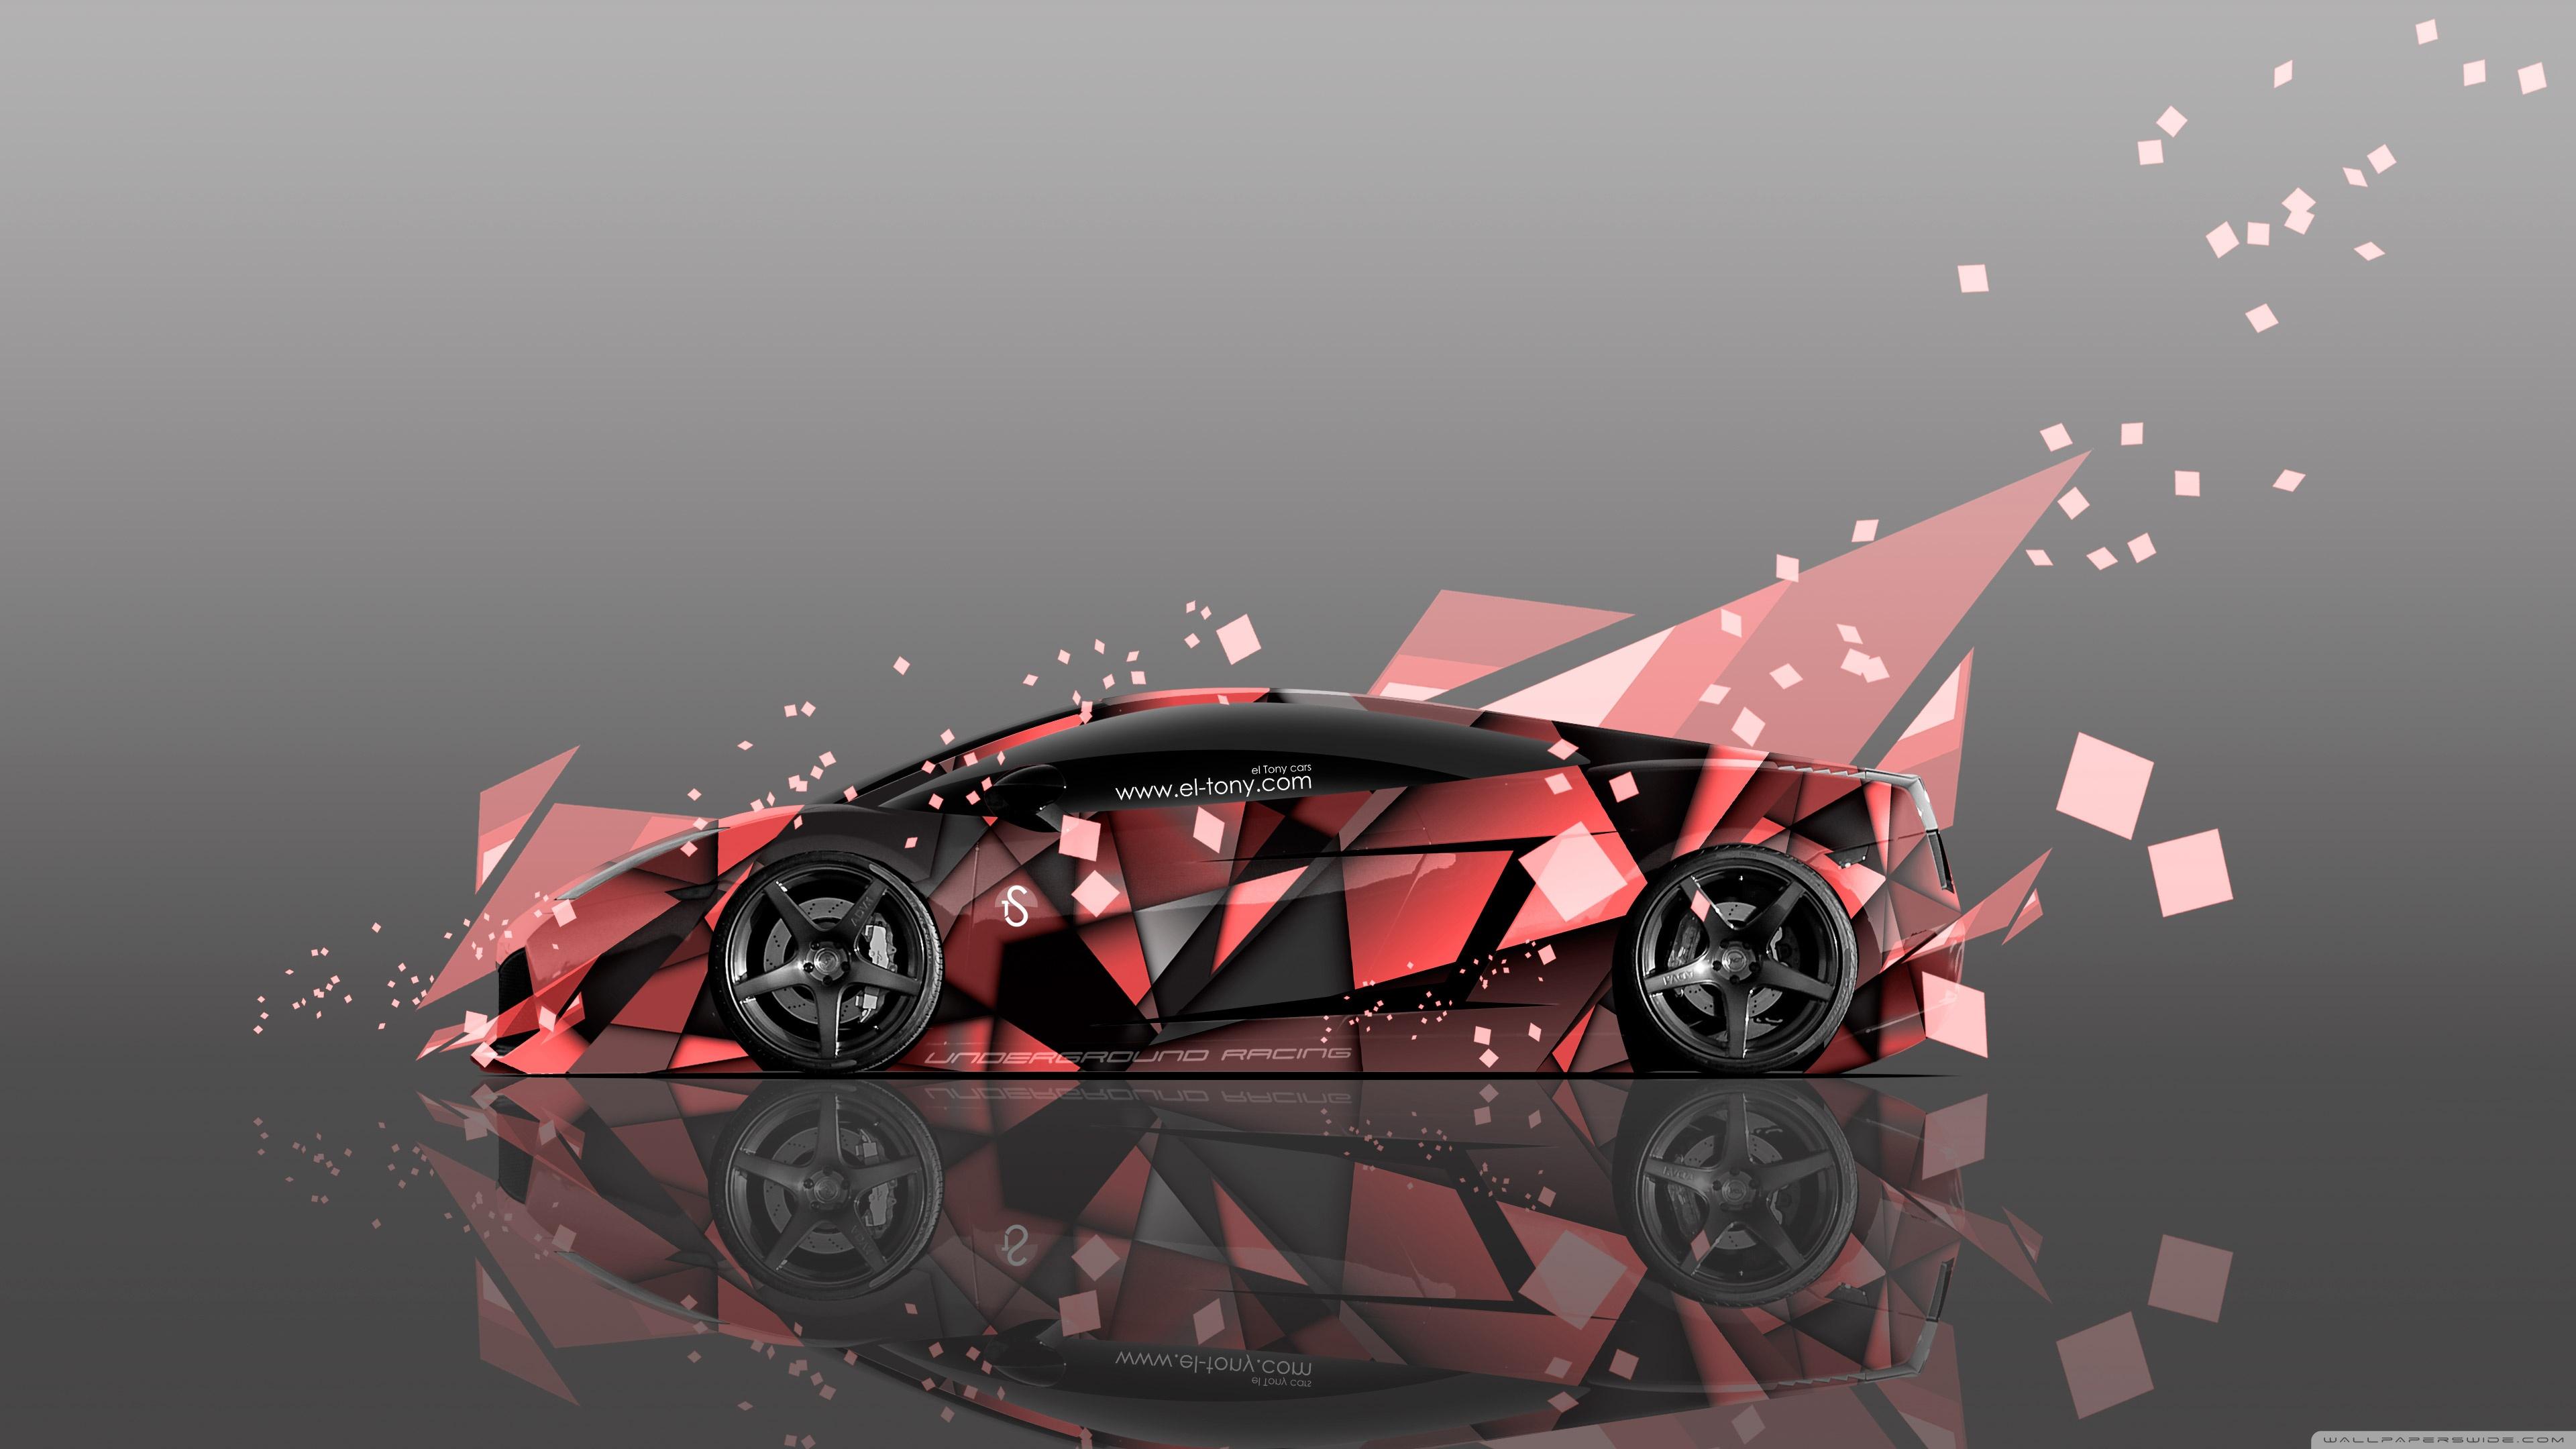 Download Free WallpaperLamborghini Gallardo Side Abstract Aerography Car Design   Tony Kokhan